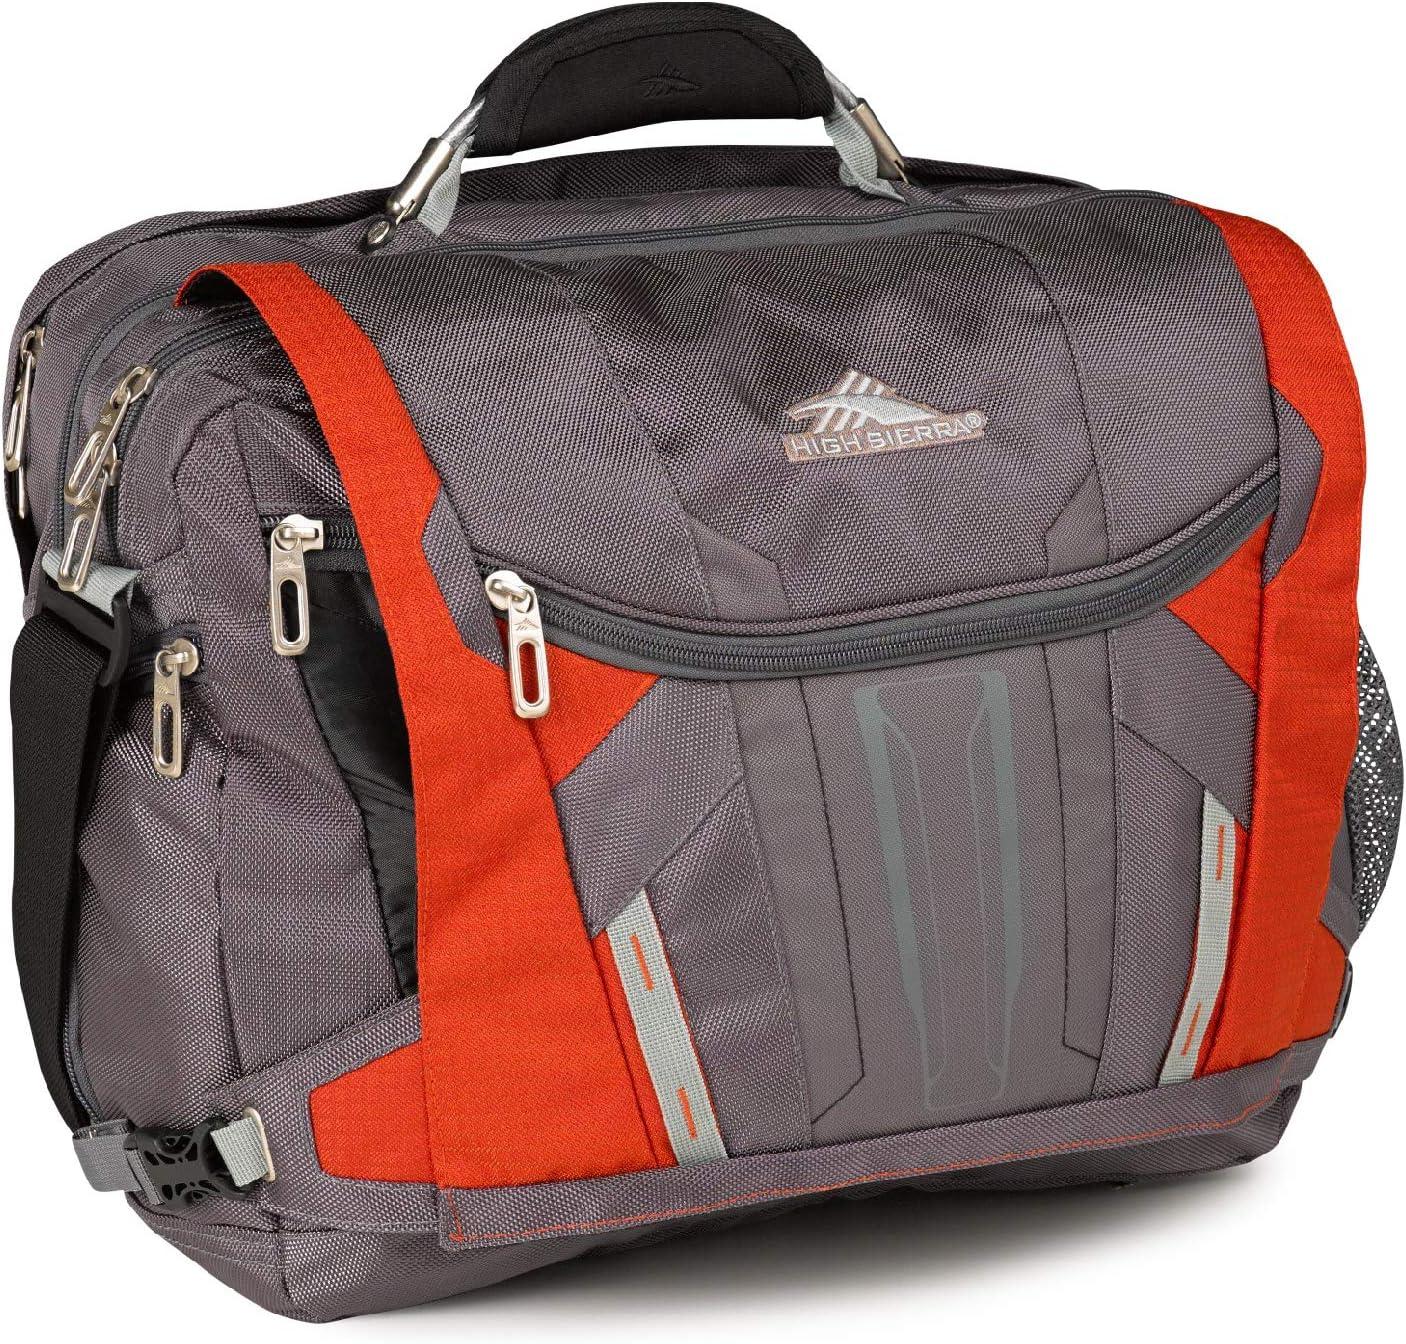 High Sierra XBT-Business Laptop Messenger Bag, Charcoal/Lava/Silver/Black, One Size